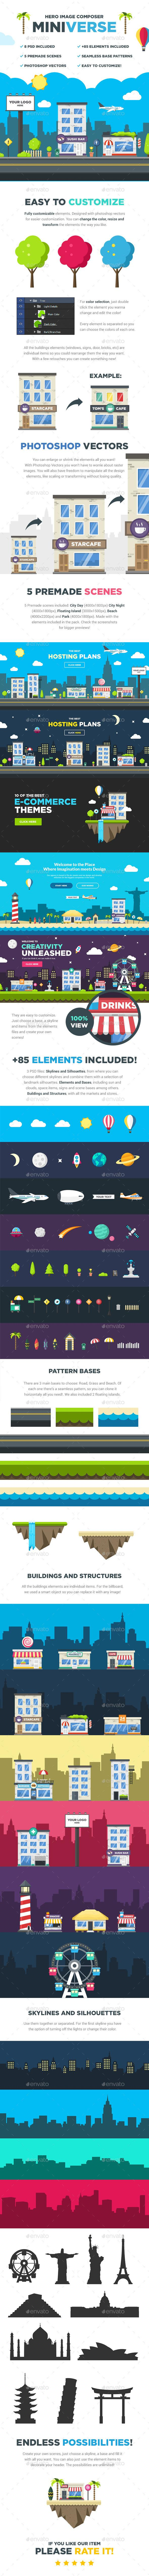 Miniverse - Hero Image Composer - Hero Images Graphics